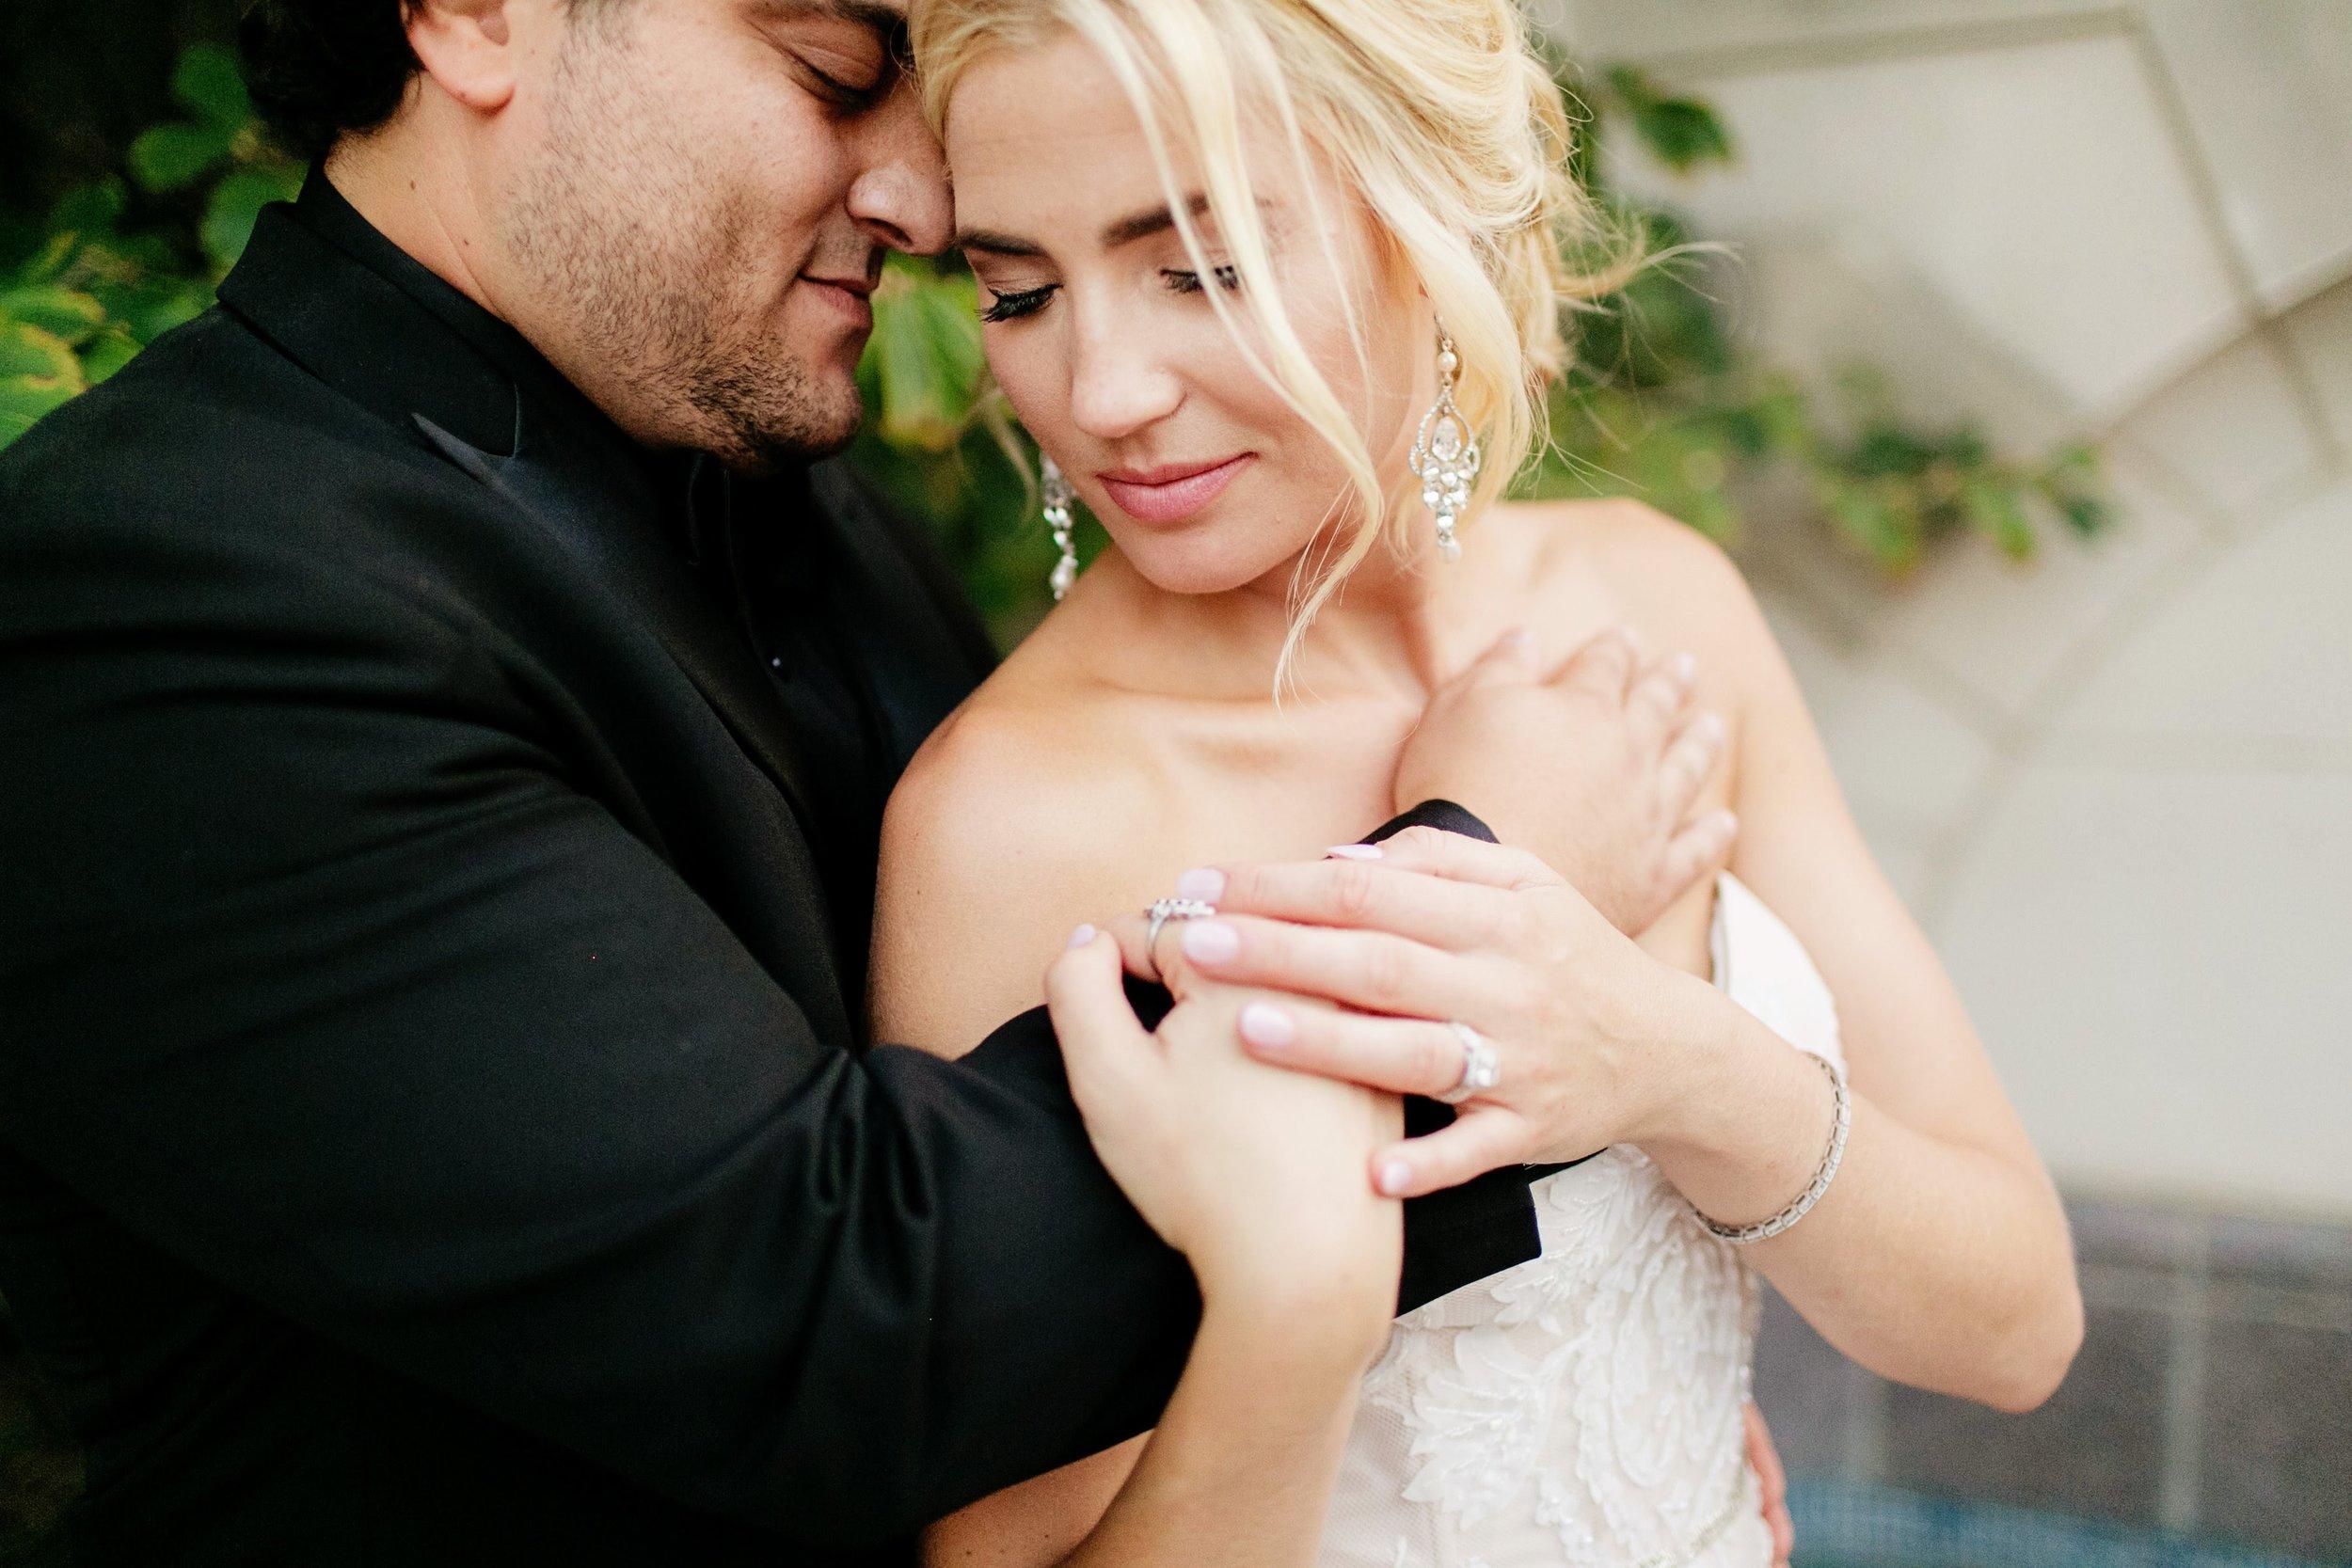 Elegant Wedding Jewelry - Luxury Bridal Earrings